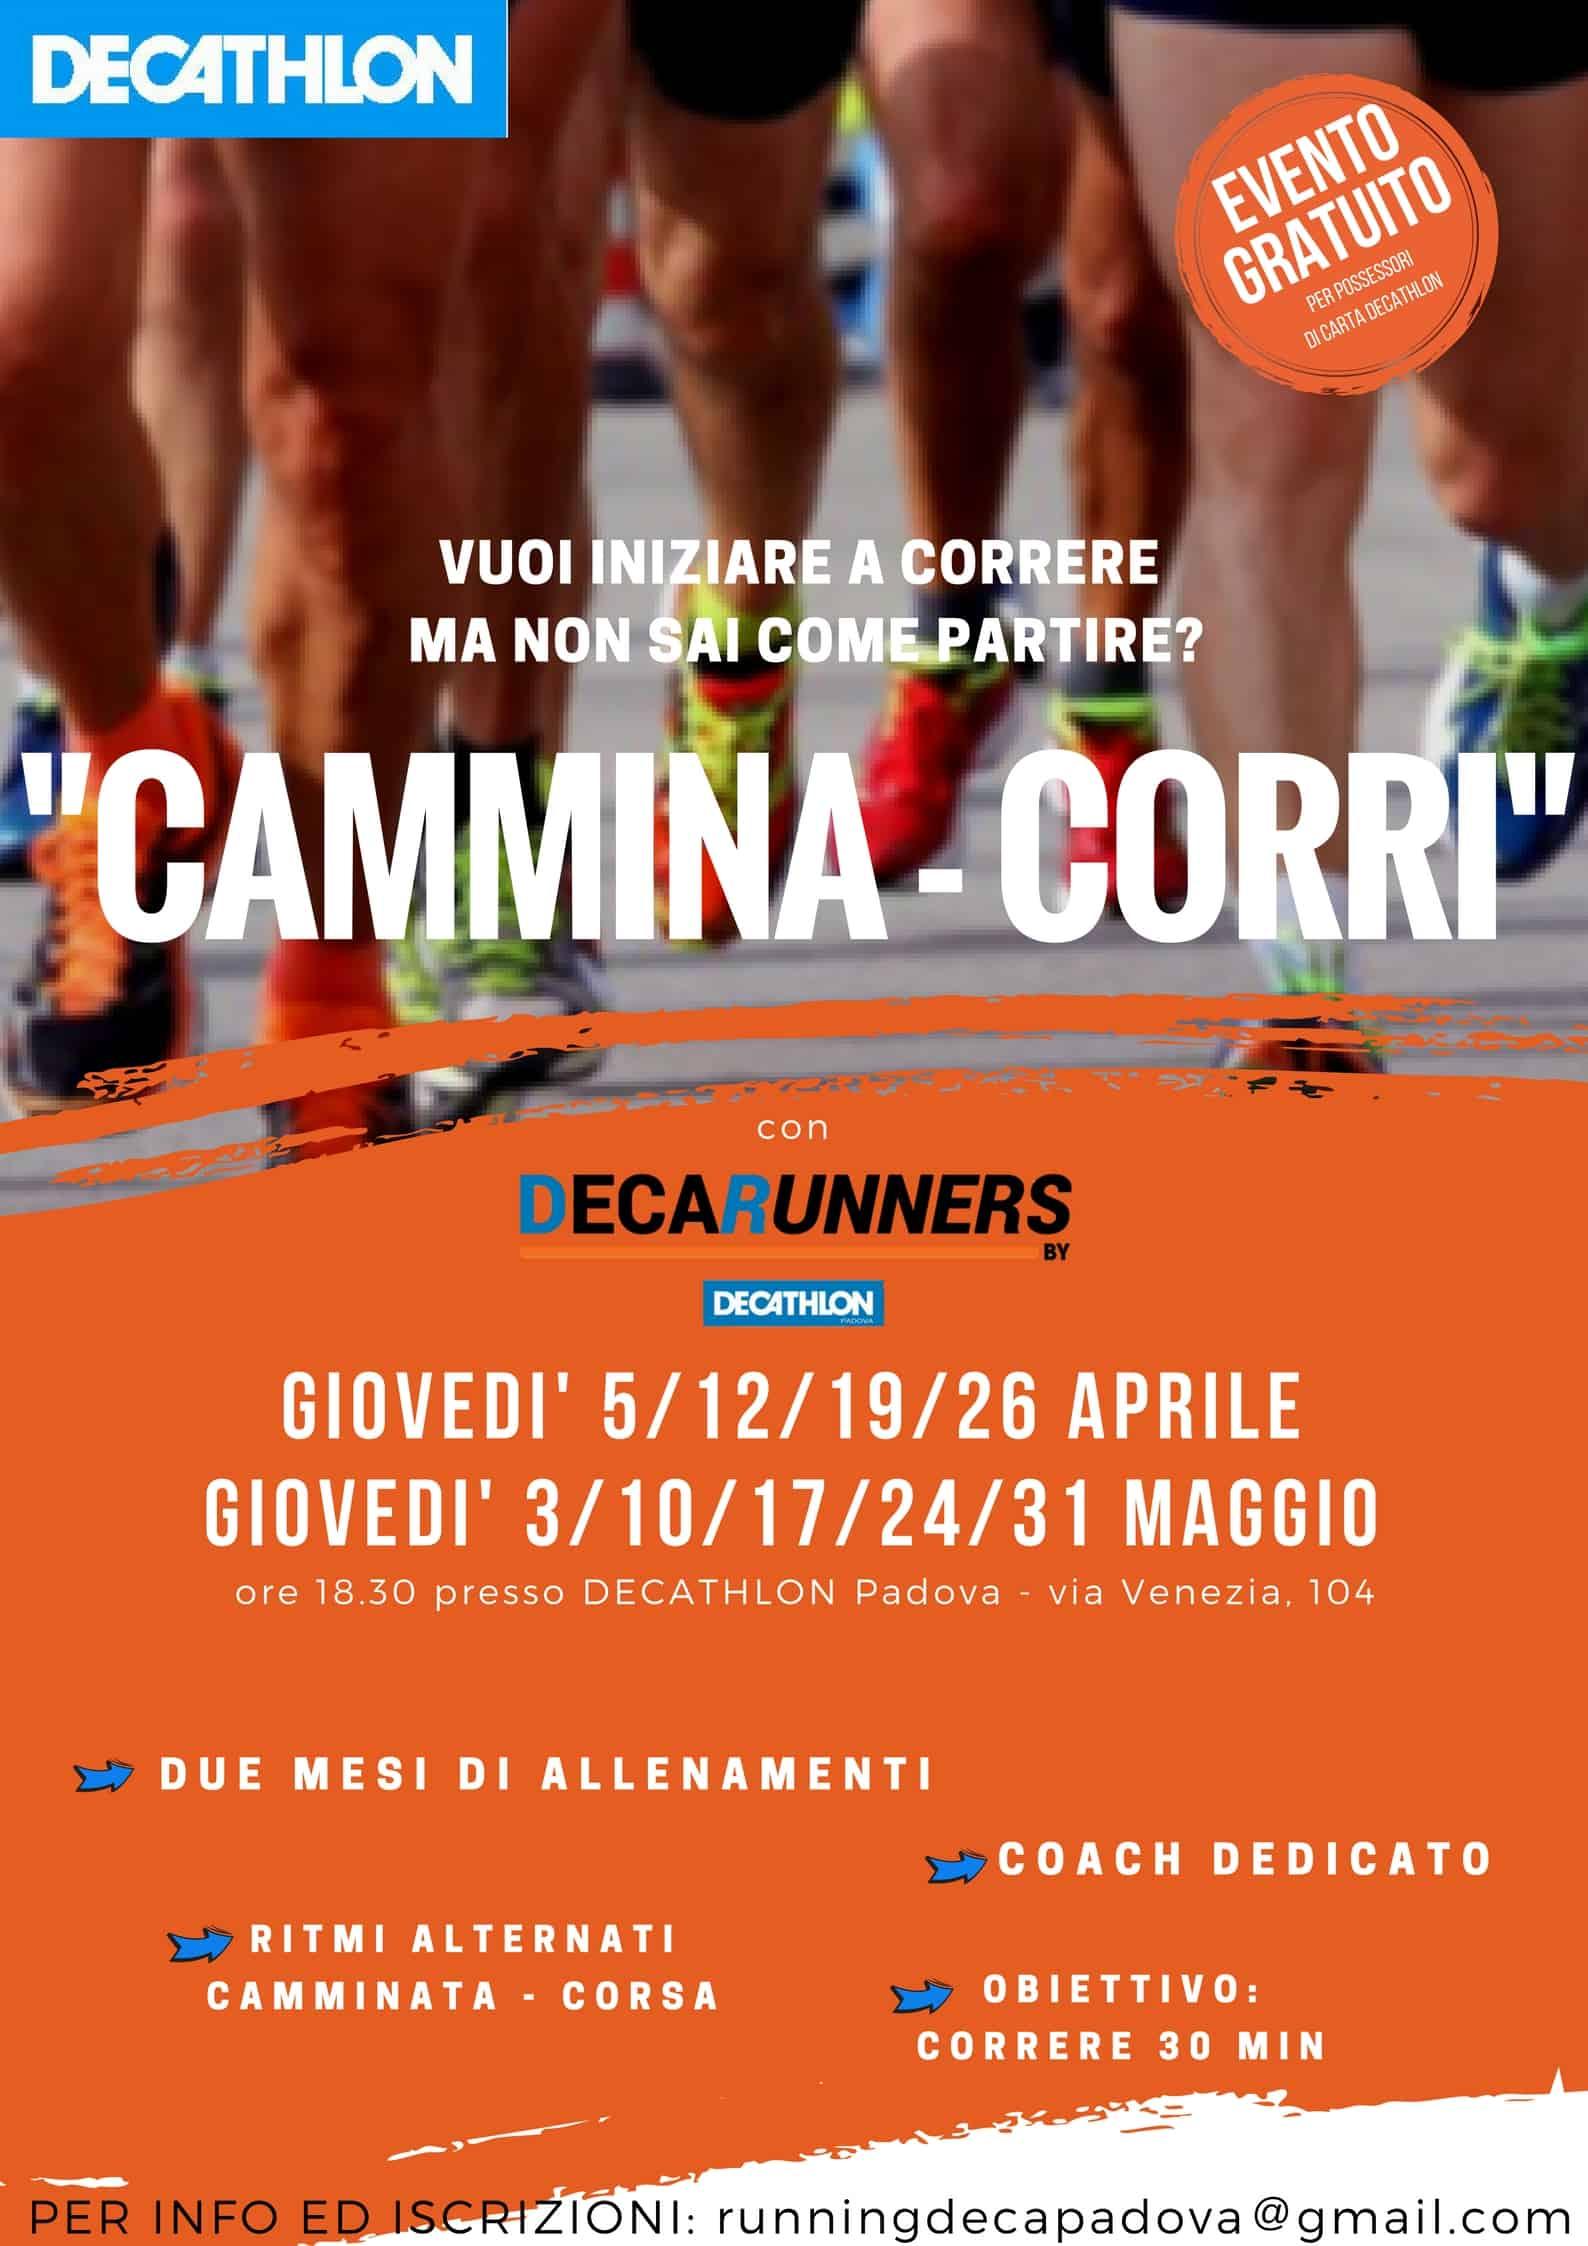 "Evento ""CAMMINA-CORRI"" by Decathlon"